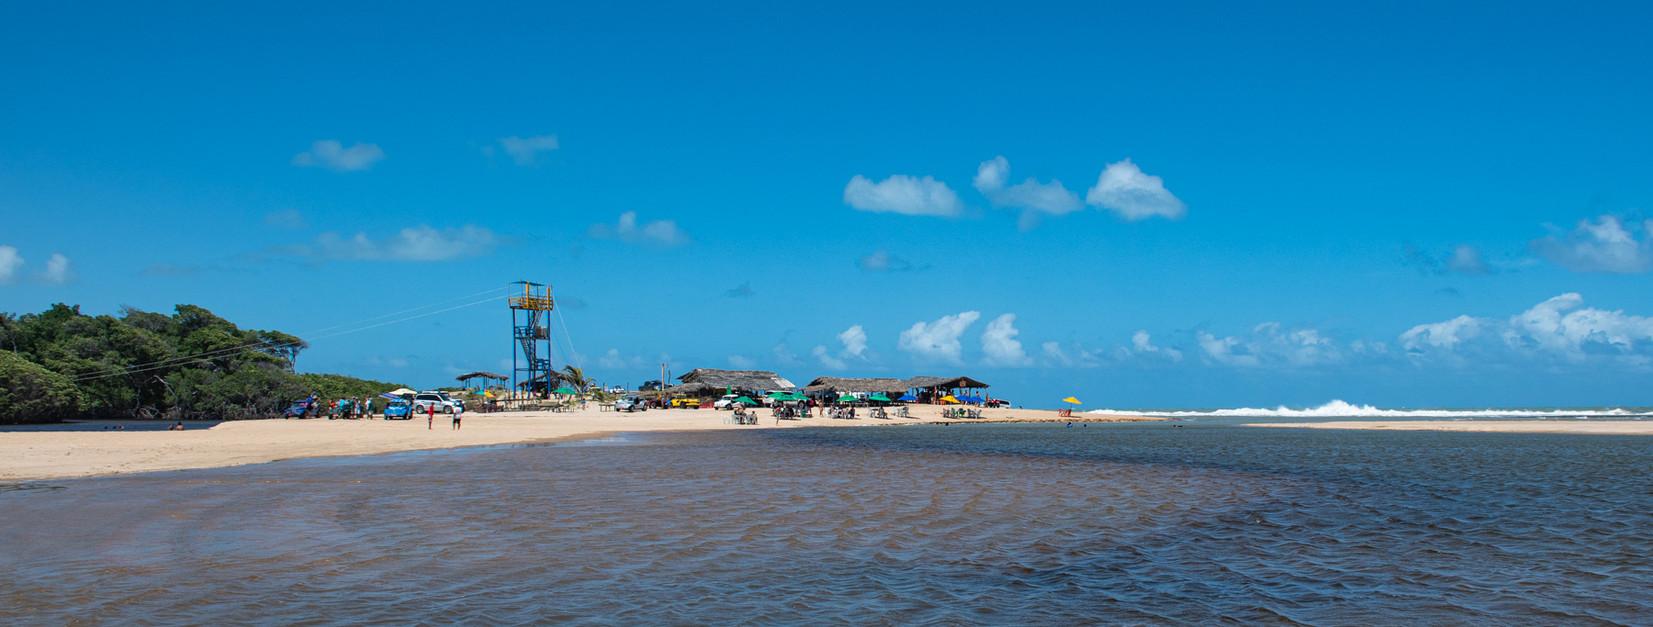 DSC_8893 praia do Sagui.jpg